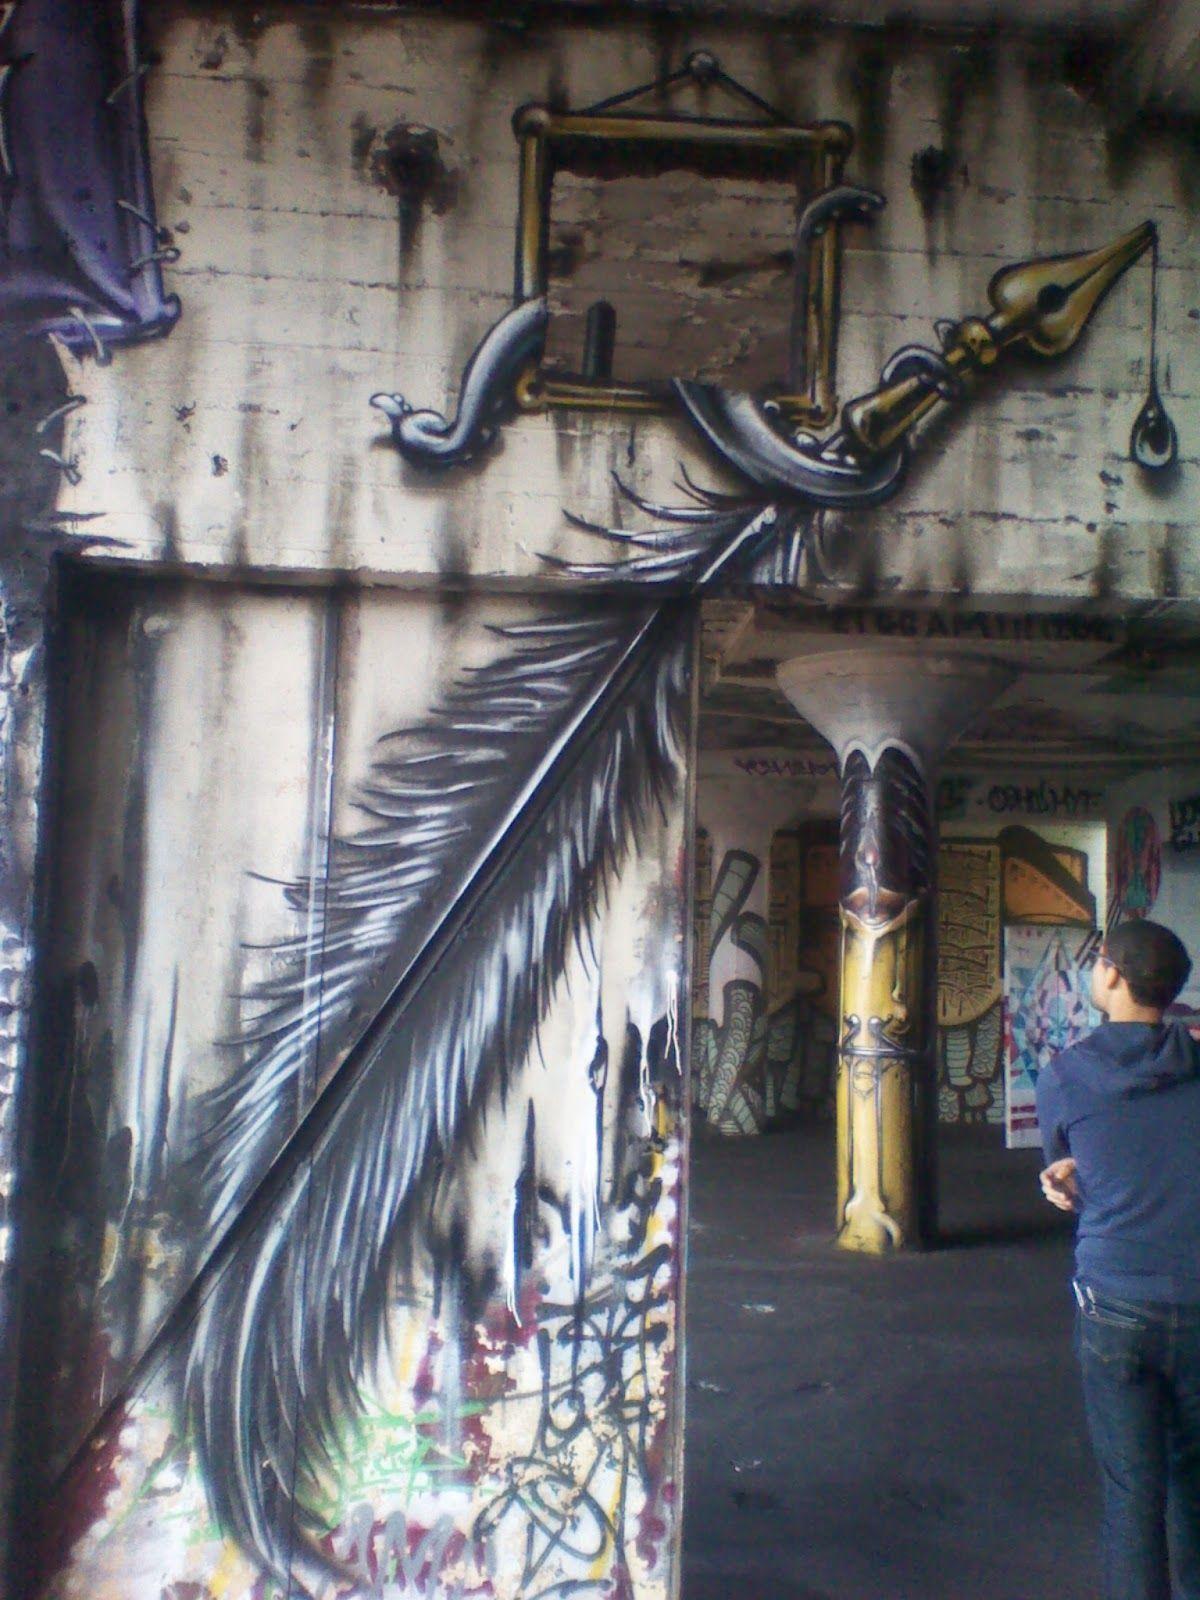 Street Art Show In Abandoned Buildinggreeting Card Designer